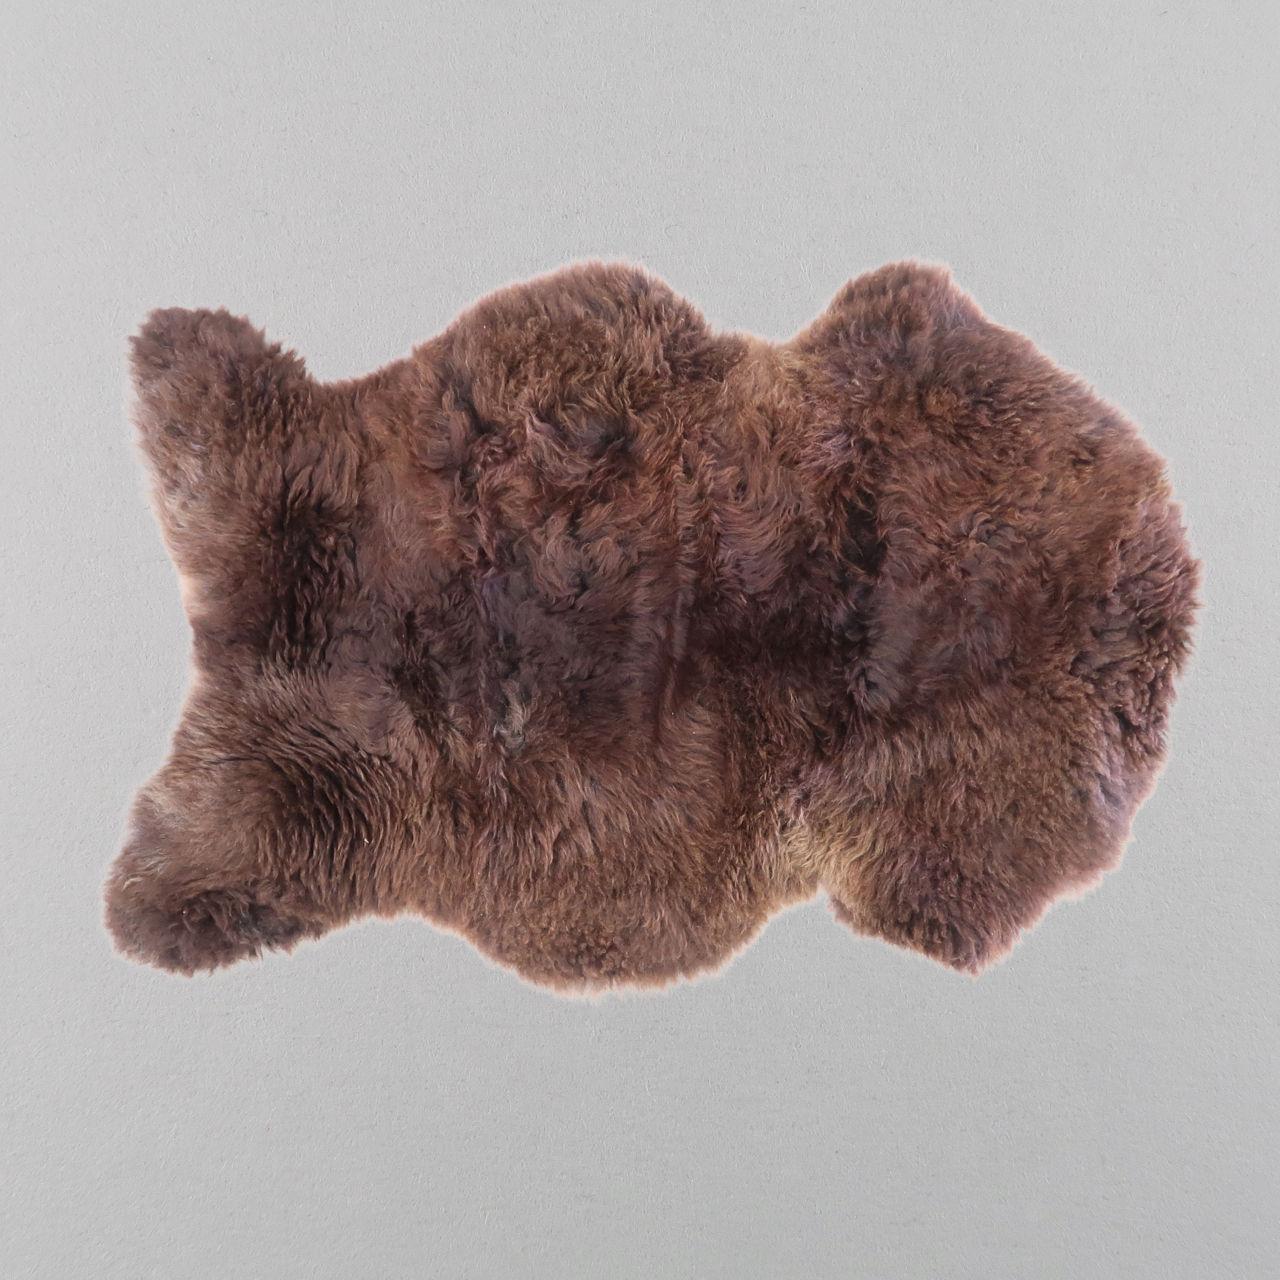 Sheepskin - Rare Breed - Medium